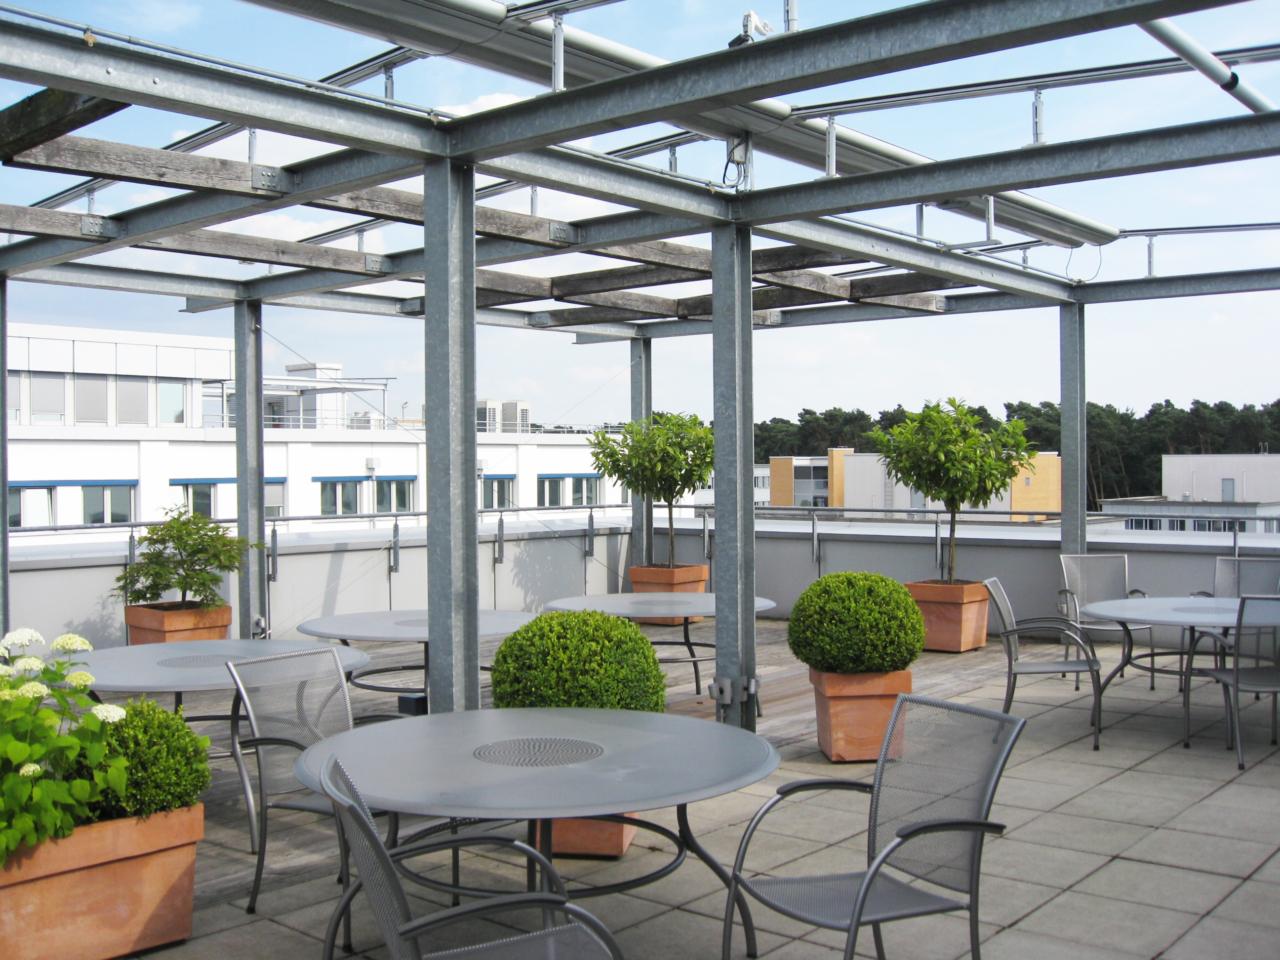 Dachgarten Bürogebäude Hugenottenalle Neu-Isenburg